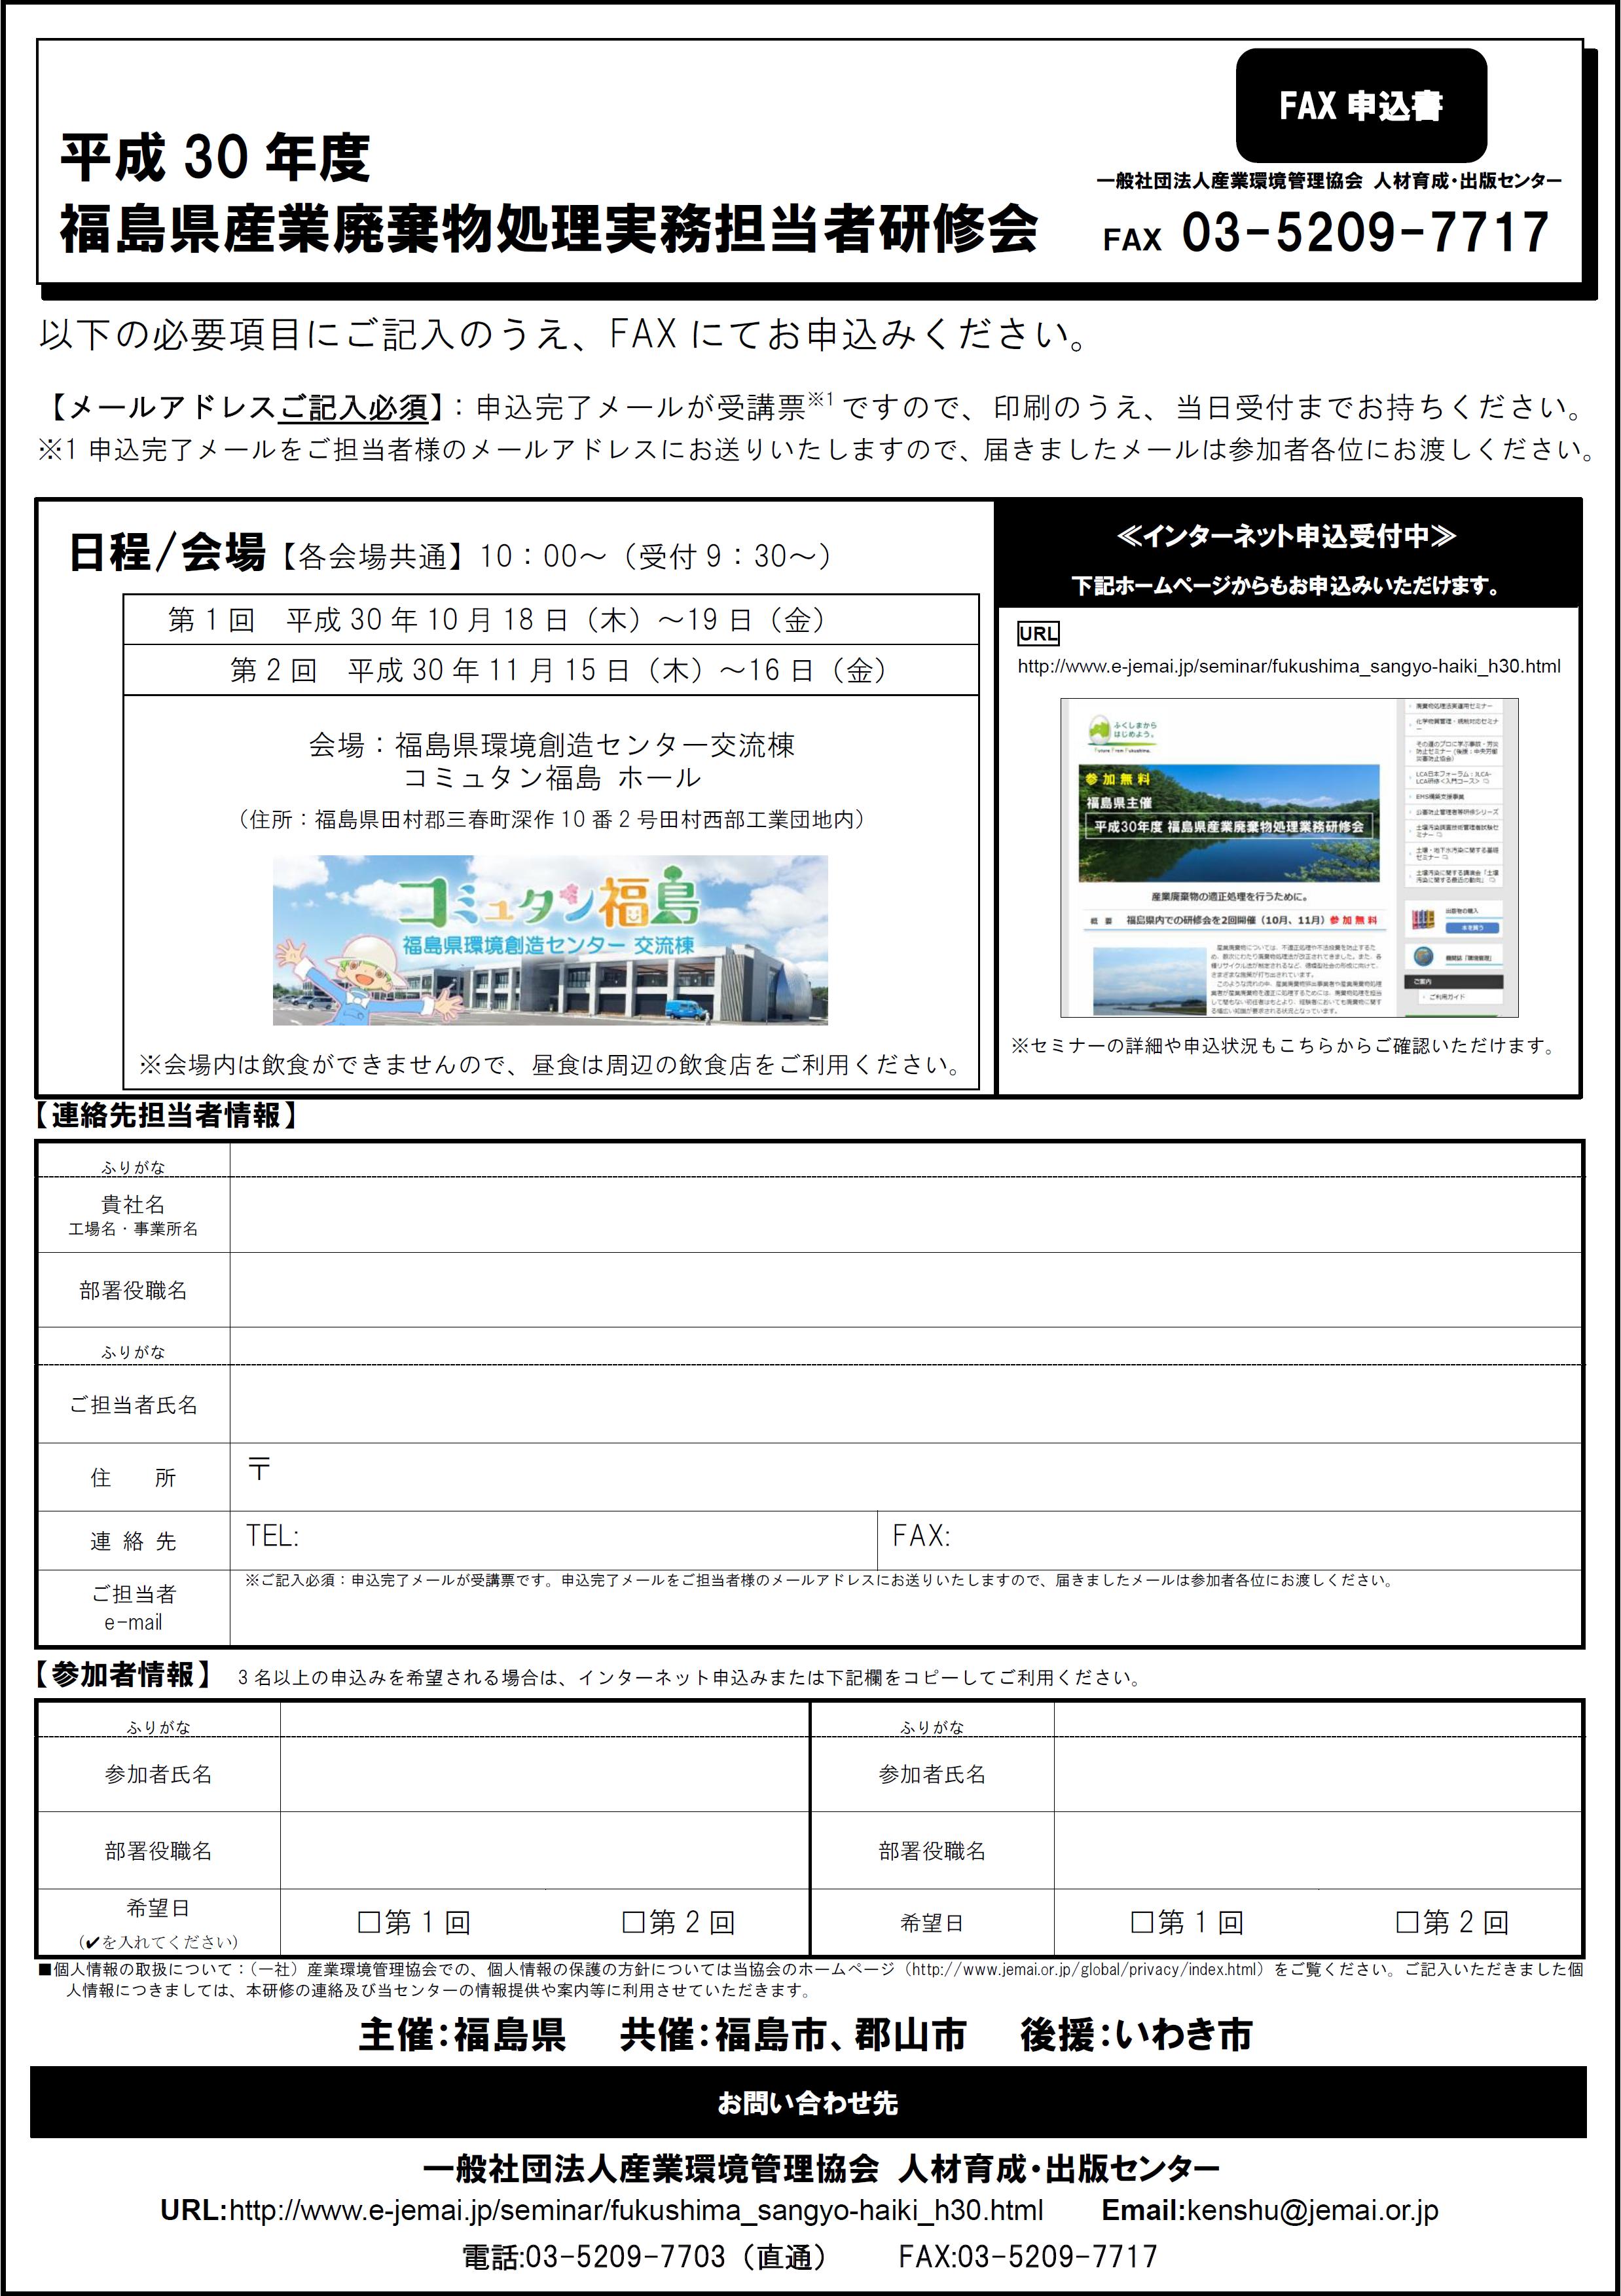 fukushima_haikibutsu-fax-templete.png